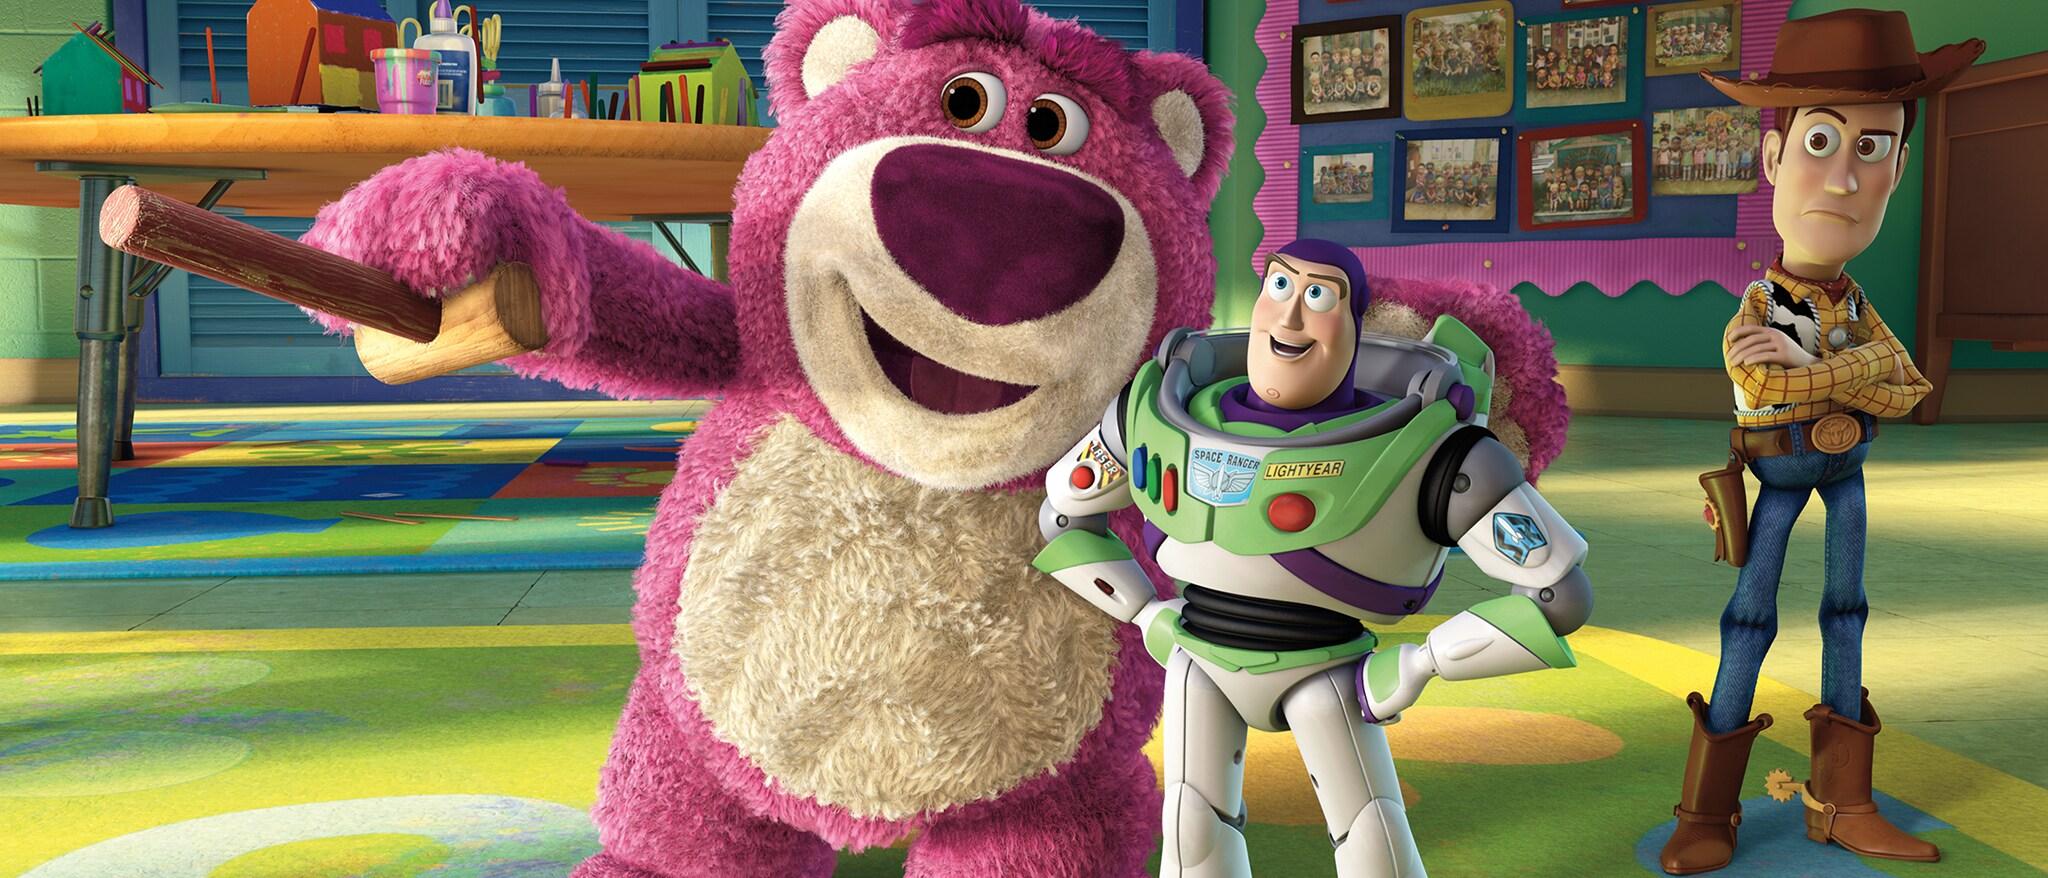 Toy Story 3 Hero